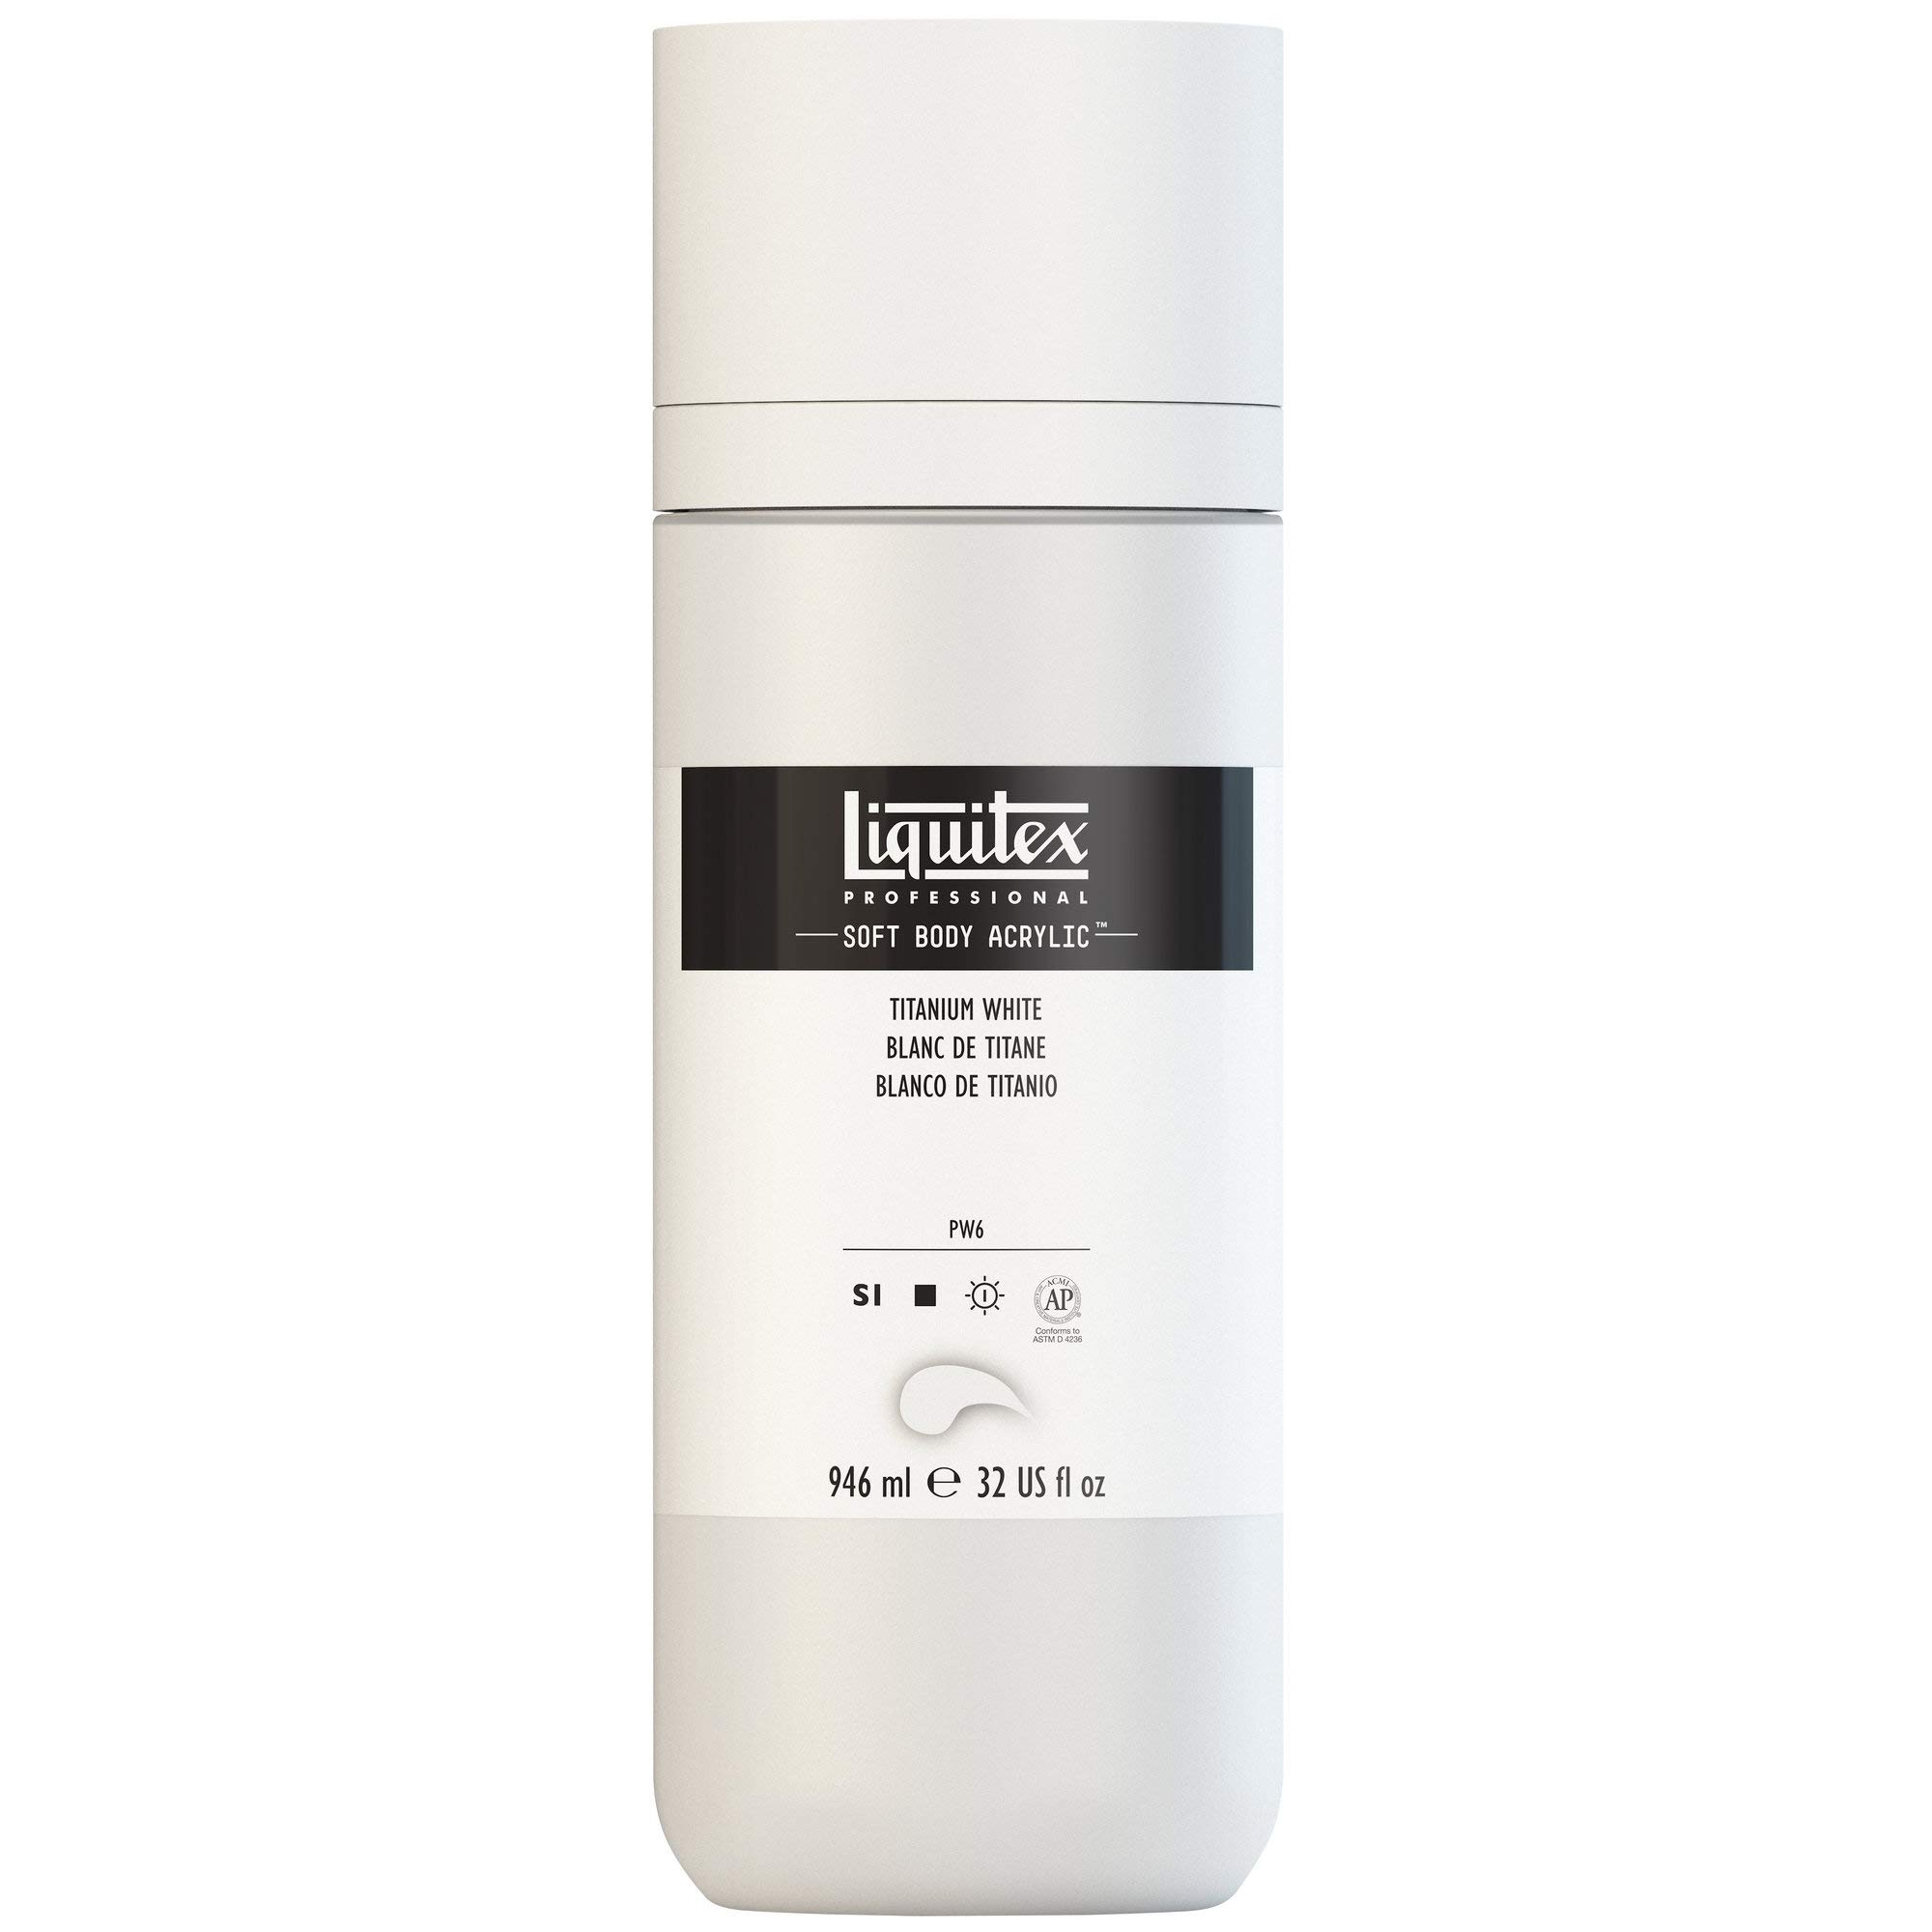 Liquitex Professional Soft Body Acrylic Paint 32-oz bottle, Titanium White